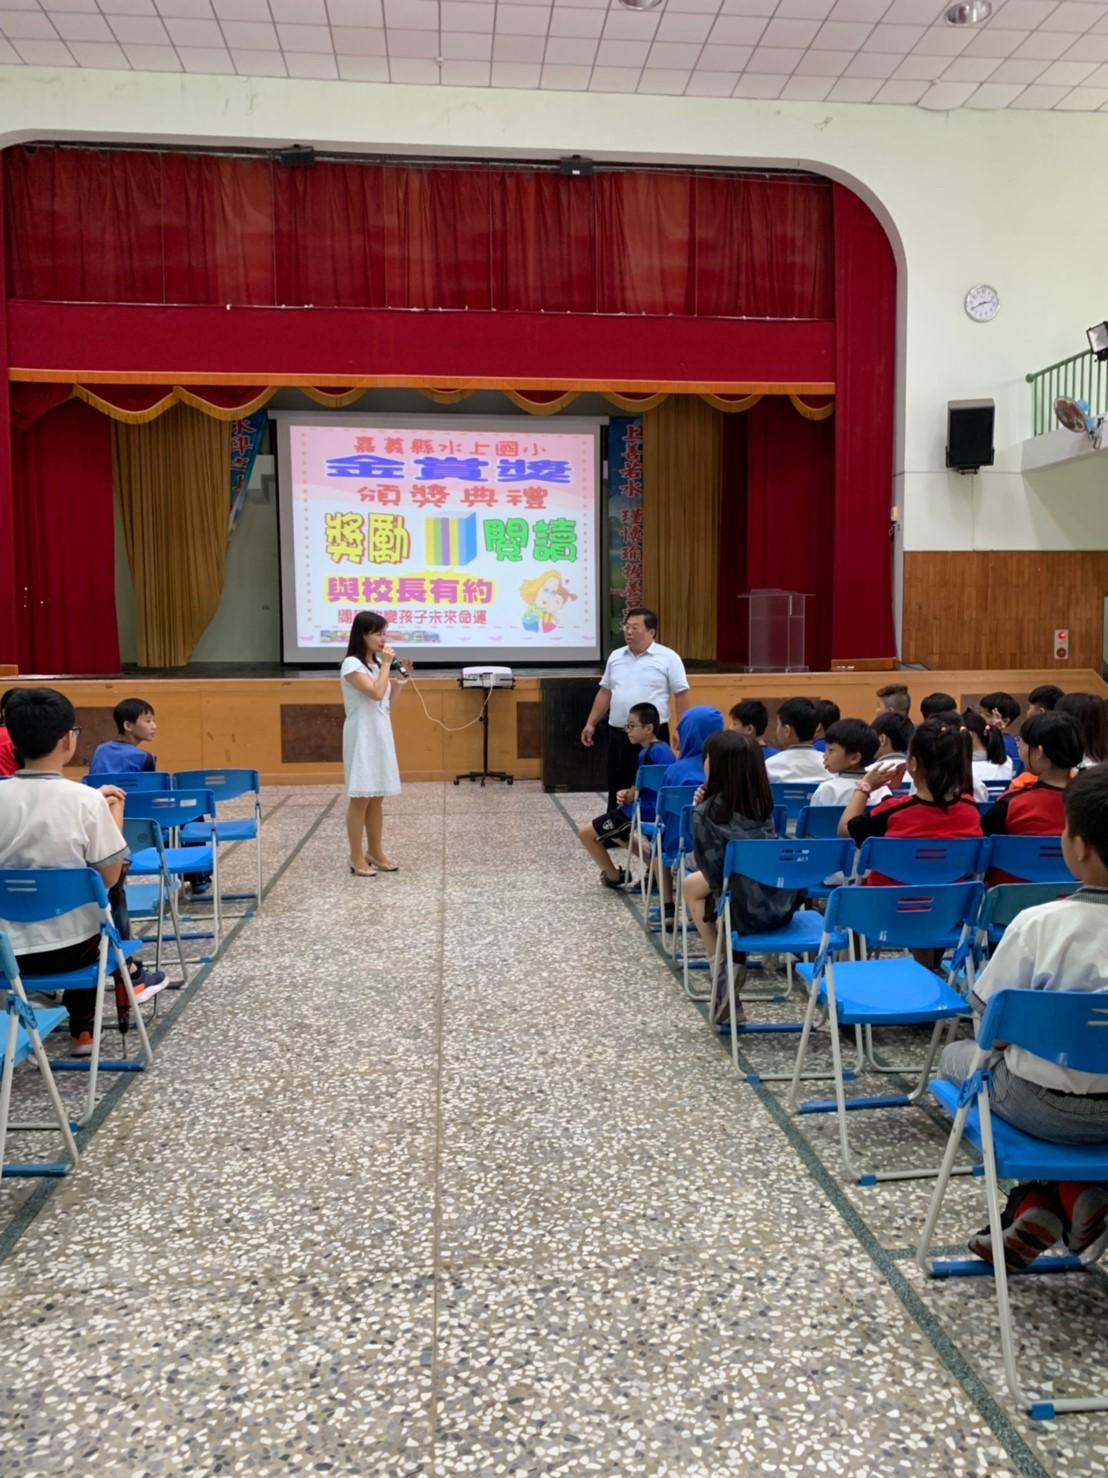 http://www.shsps.cyc.edu.tw/uploads/tadgallery/2019_06_24/1381_金賞獎_190621_0001.jpg